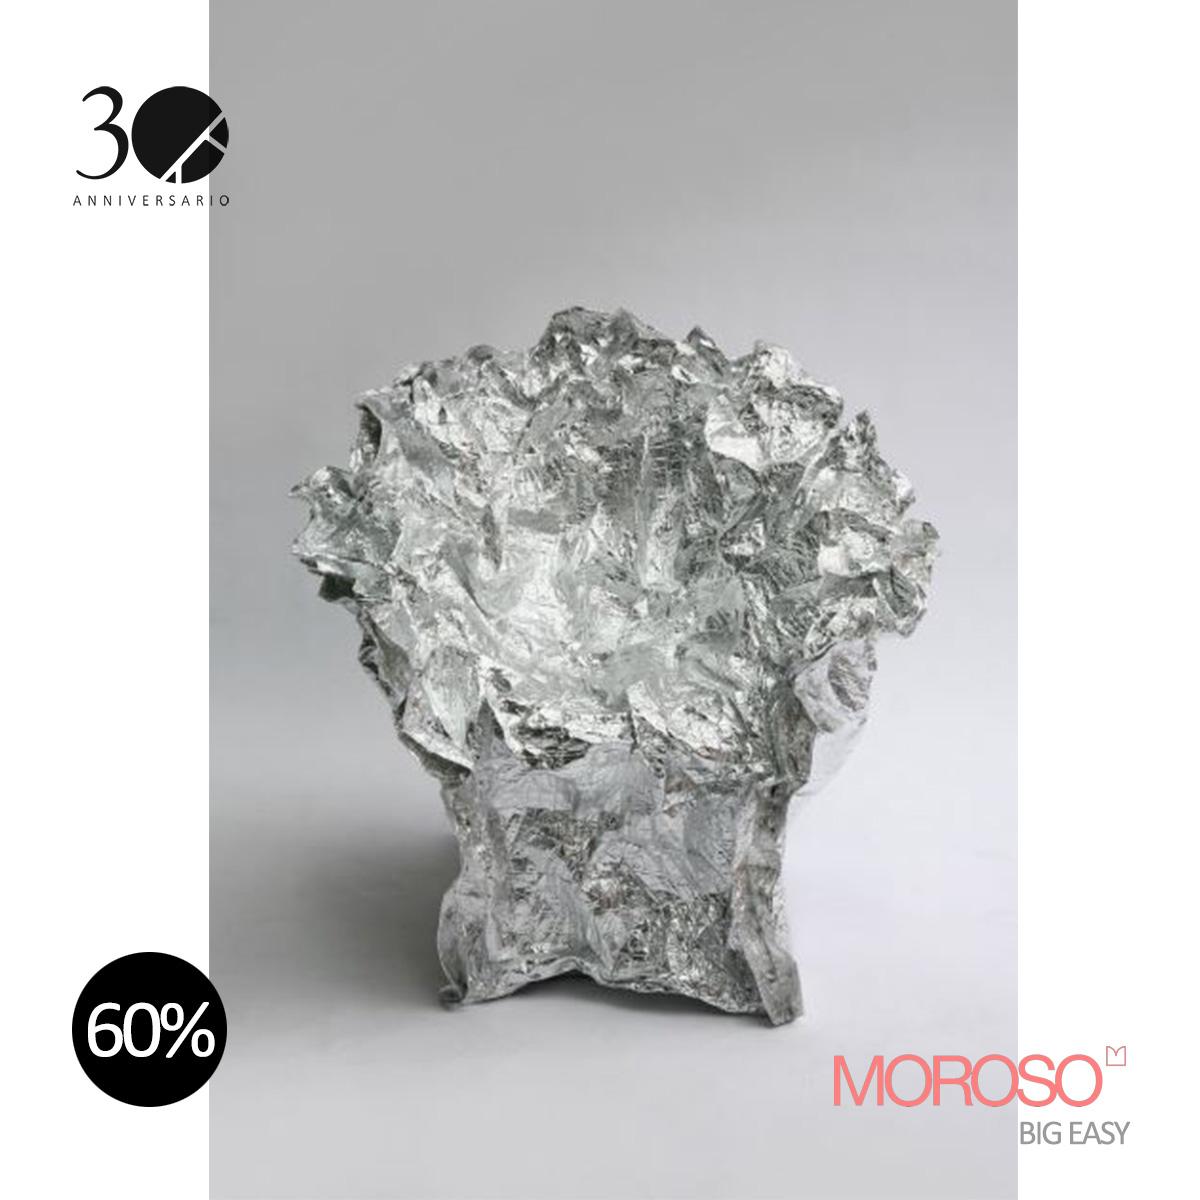 MOROSO - MEMORY